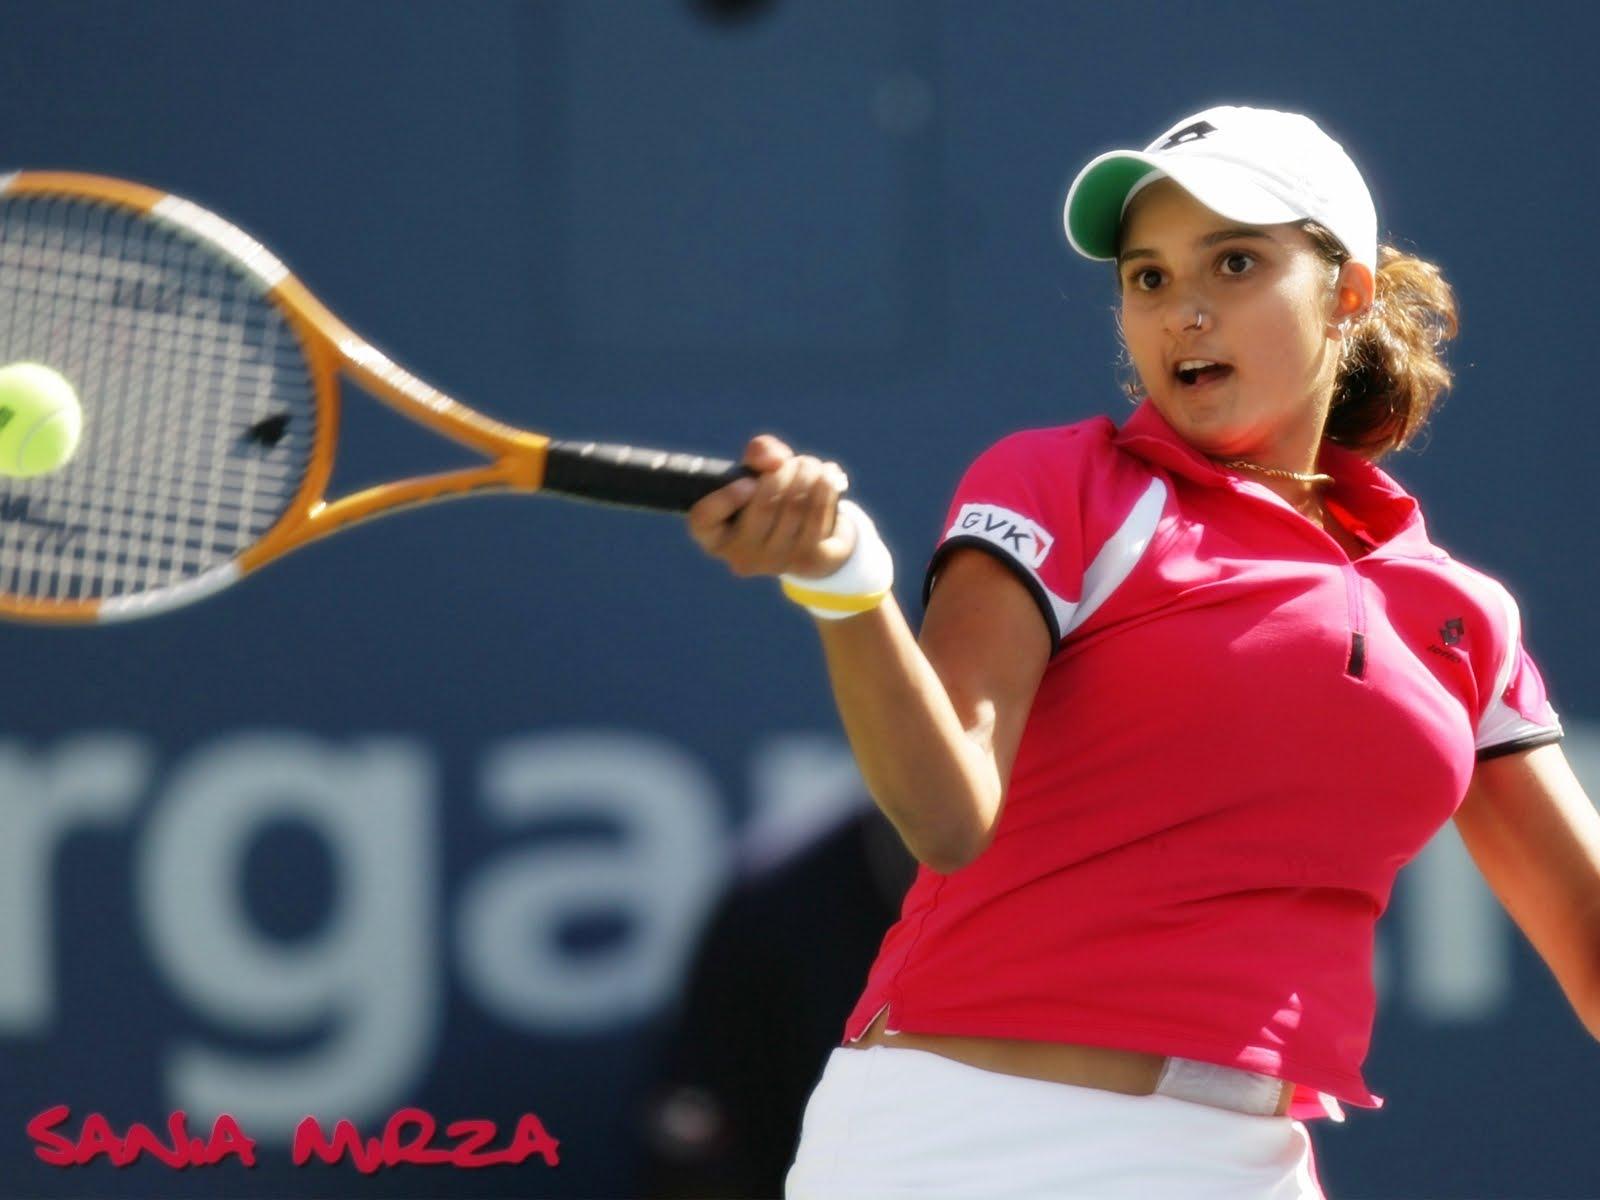 Sania Mirza Widescreen Wallpapers - Tennis Star  Female -2012